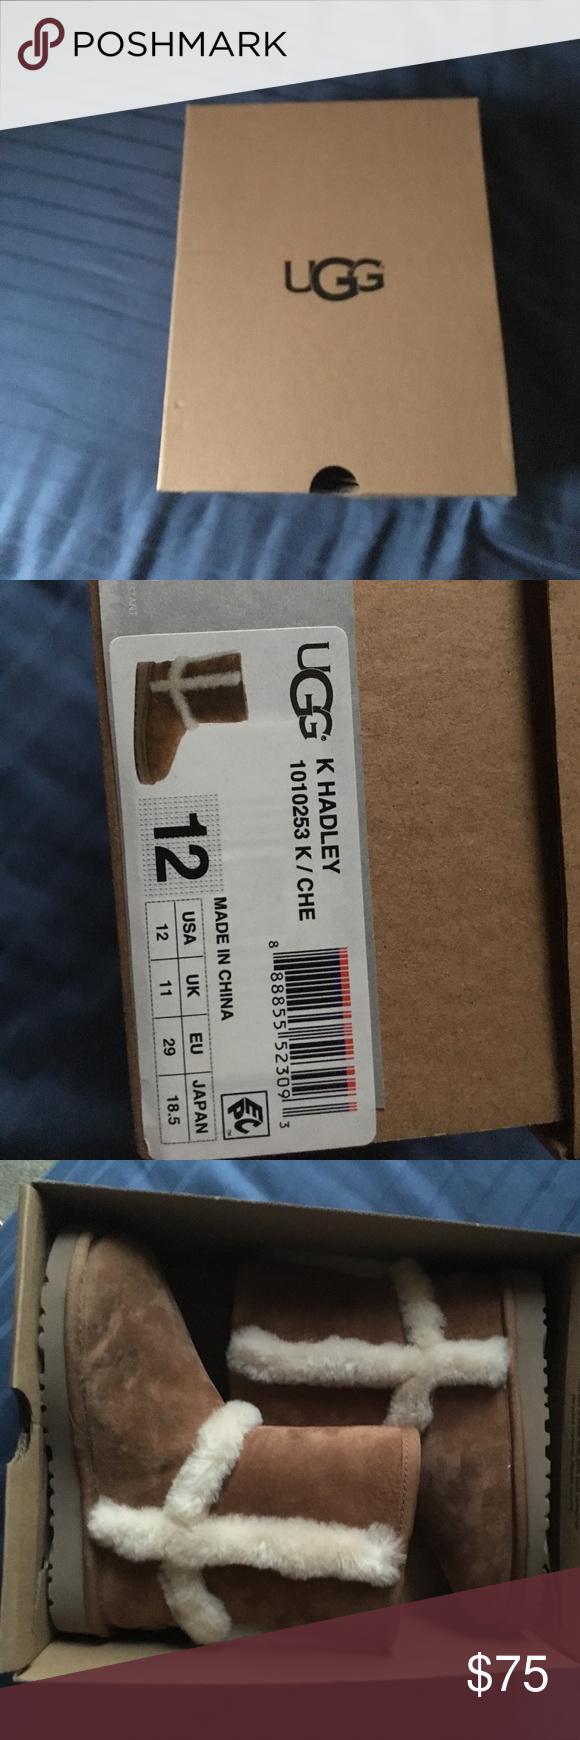 9dbb6a5cf74 Kids size 12 UGG Kids size 12 UGG Brand New ! In Box ! Never worn ...